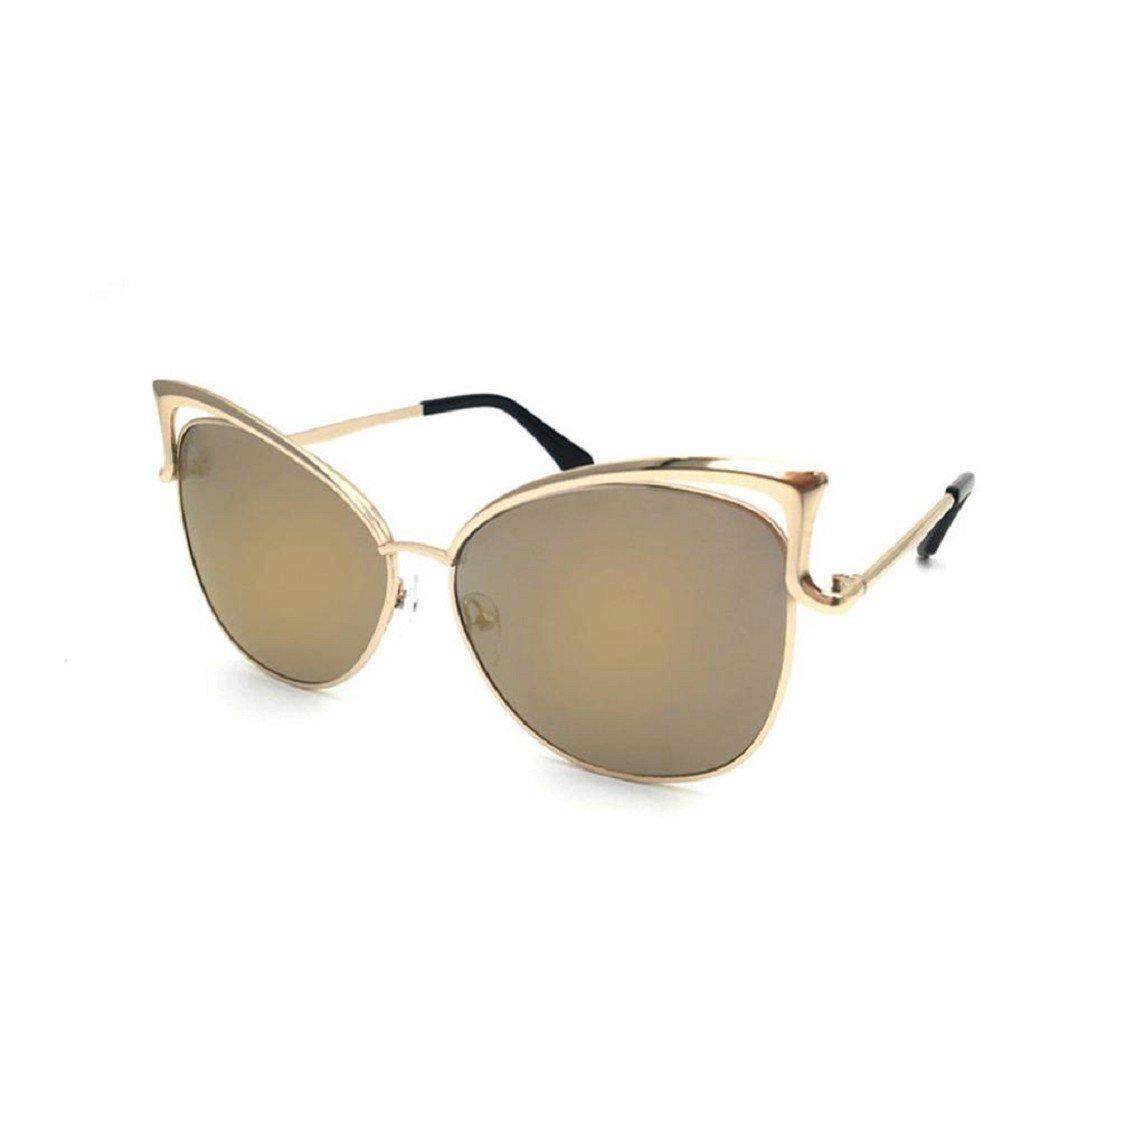 d367c2a5ed13 Amazon.com  Ikevan 2017 Fashion Retro Men Women Clear Lens Glasses Metal  Spectacle Frame Myopia Eyeglasses Sunglasses (Gold)  Musical Instruments